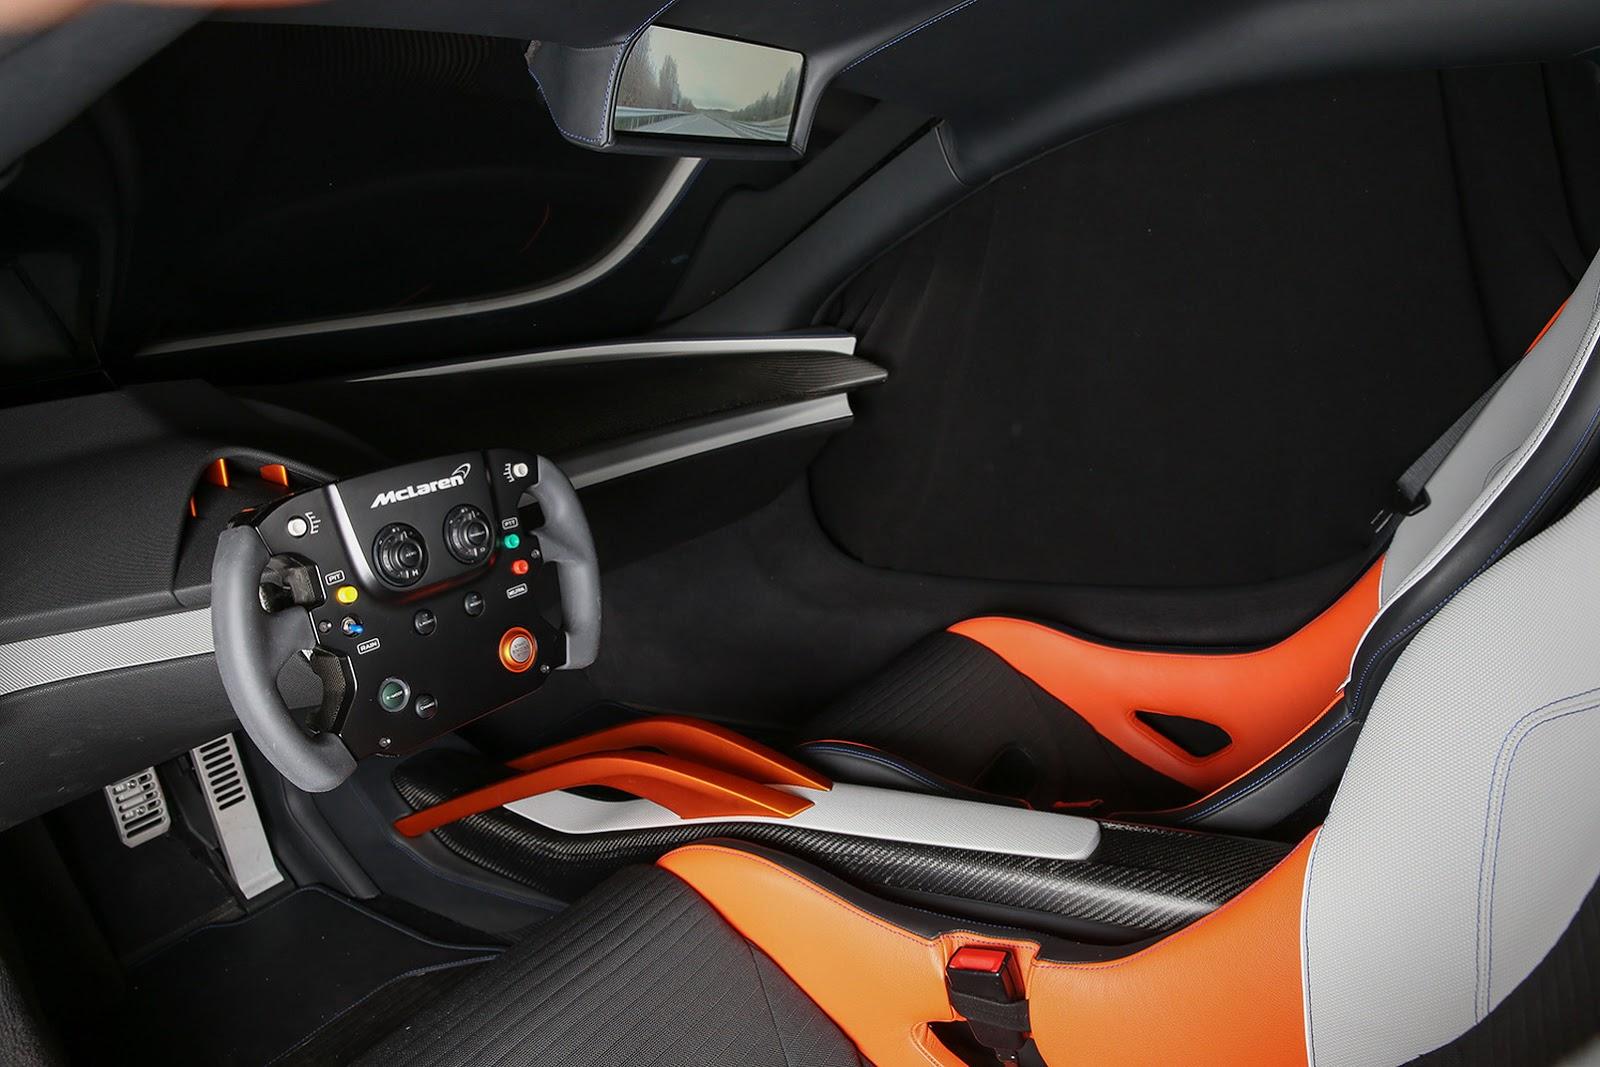 JVCKENWOOD presented a McLaren 675LT with a high-tech interior at CES